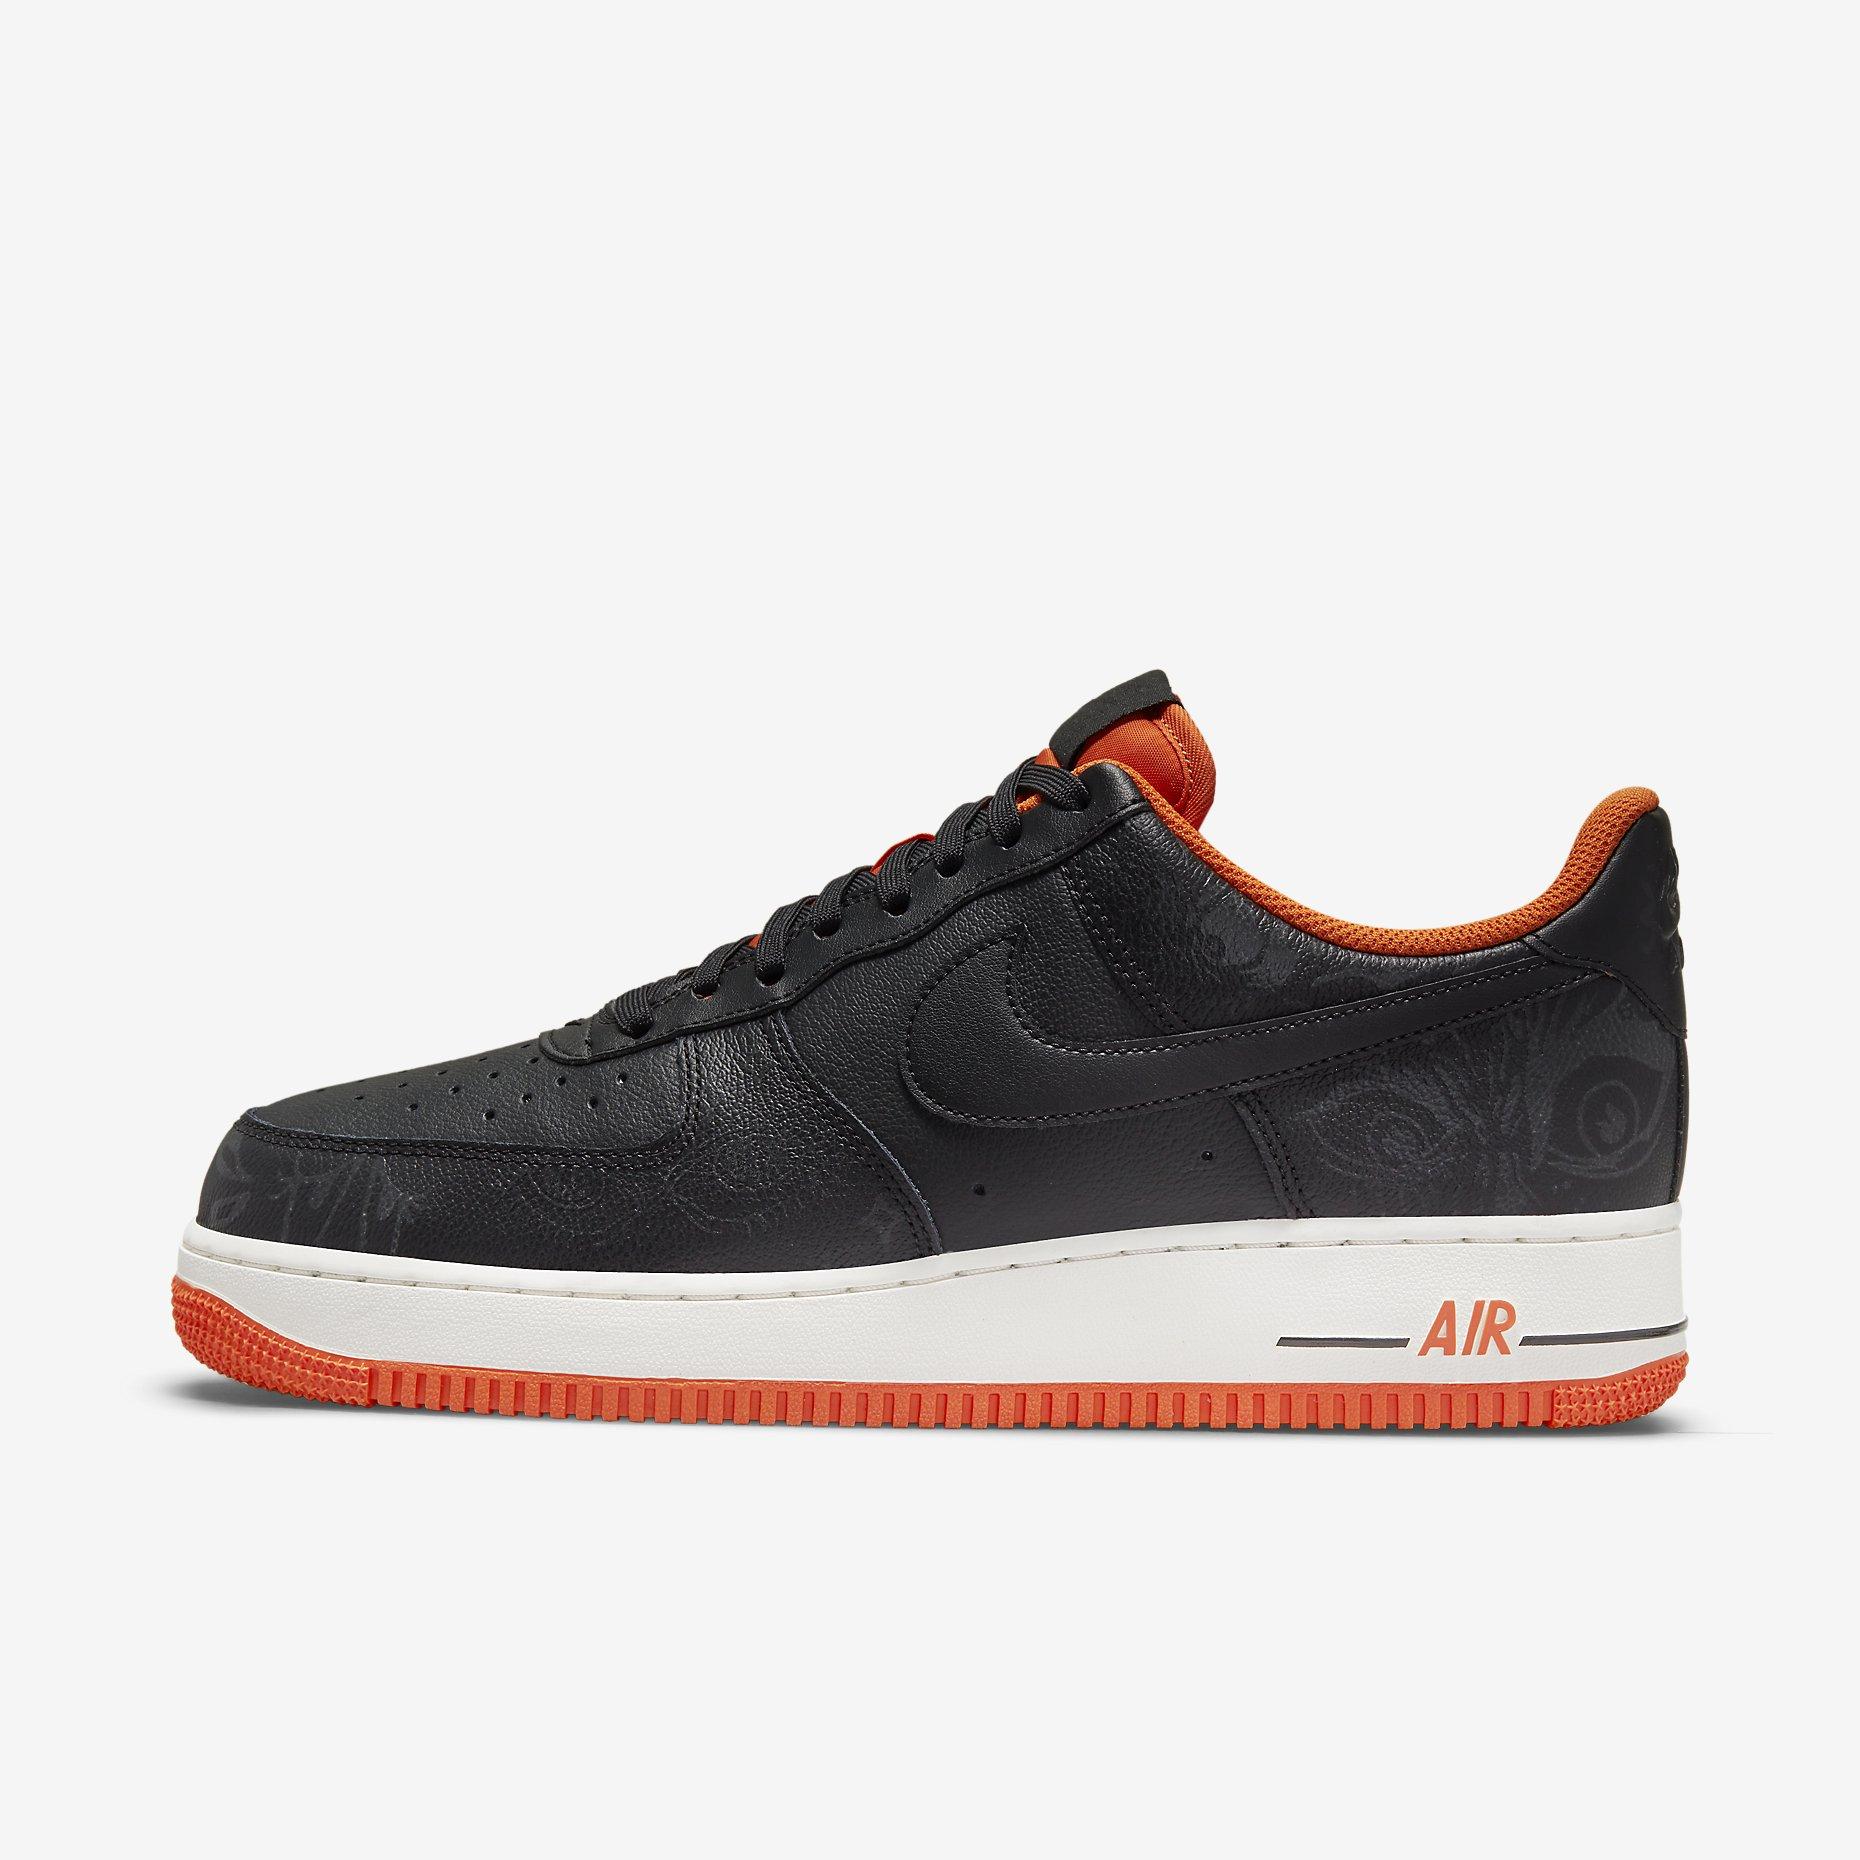 Nike Air Force 1 Low PRM 'Halloween'